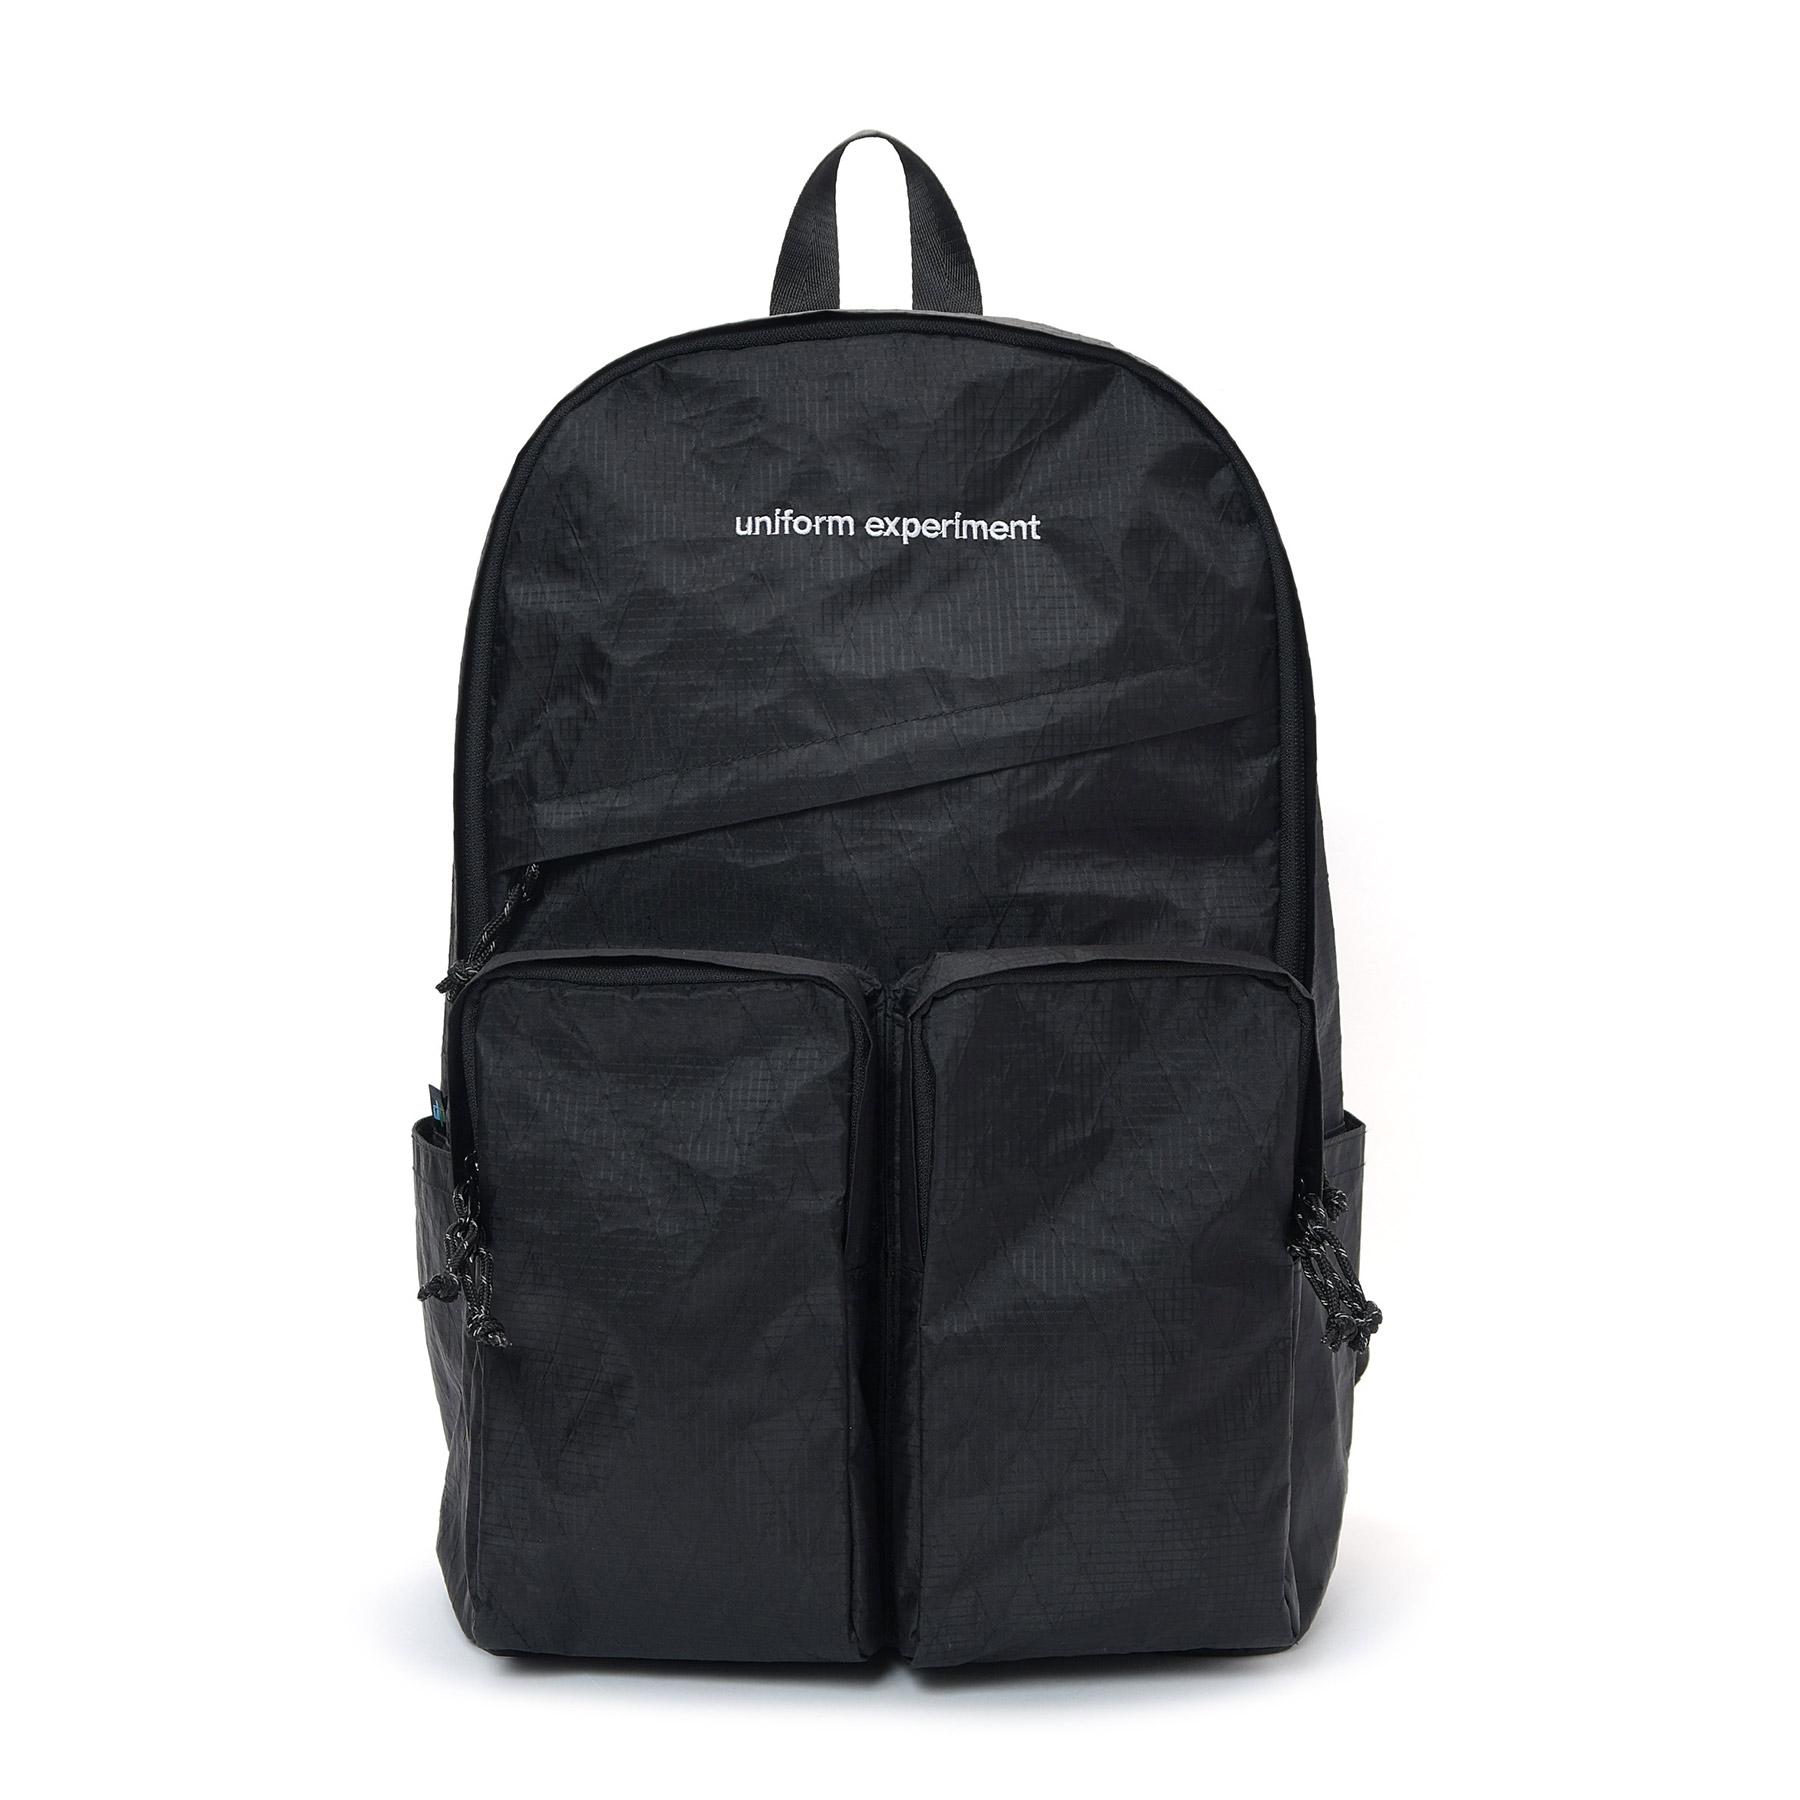 uniform experiment / BACK PACK -Black